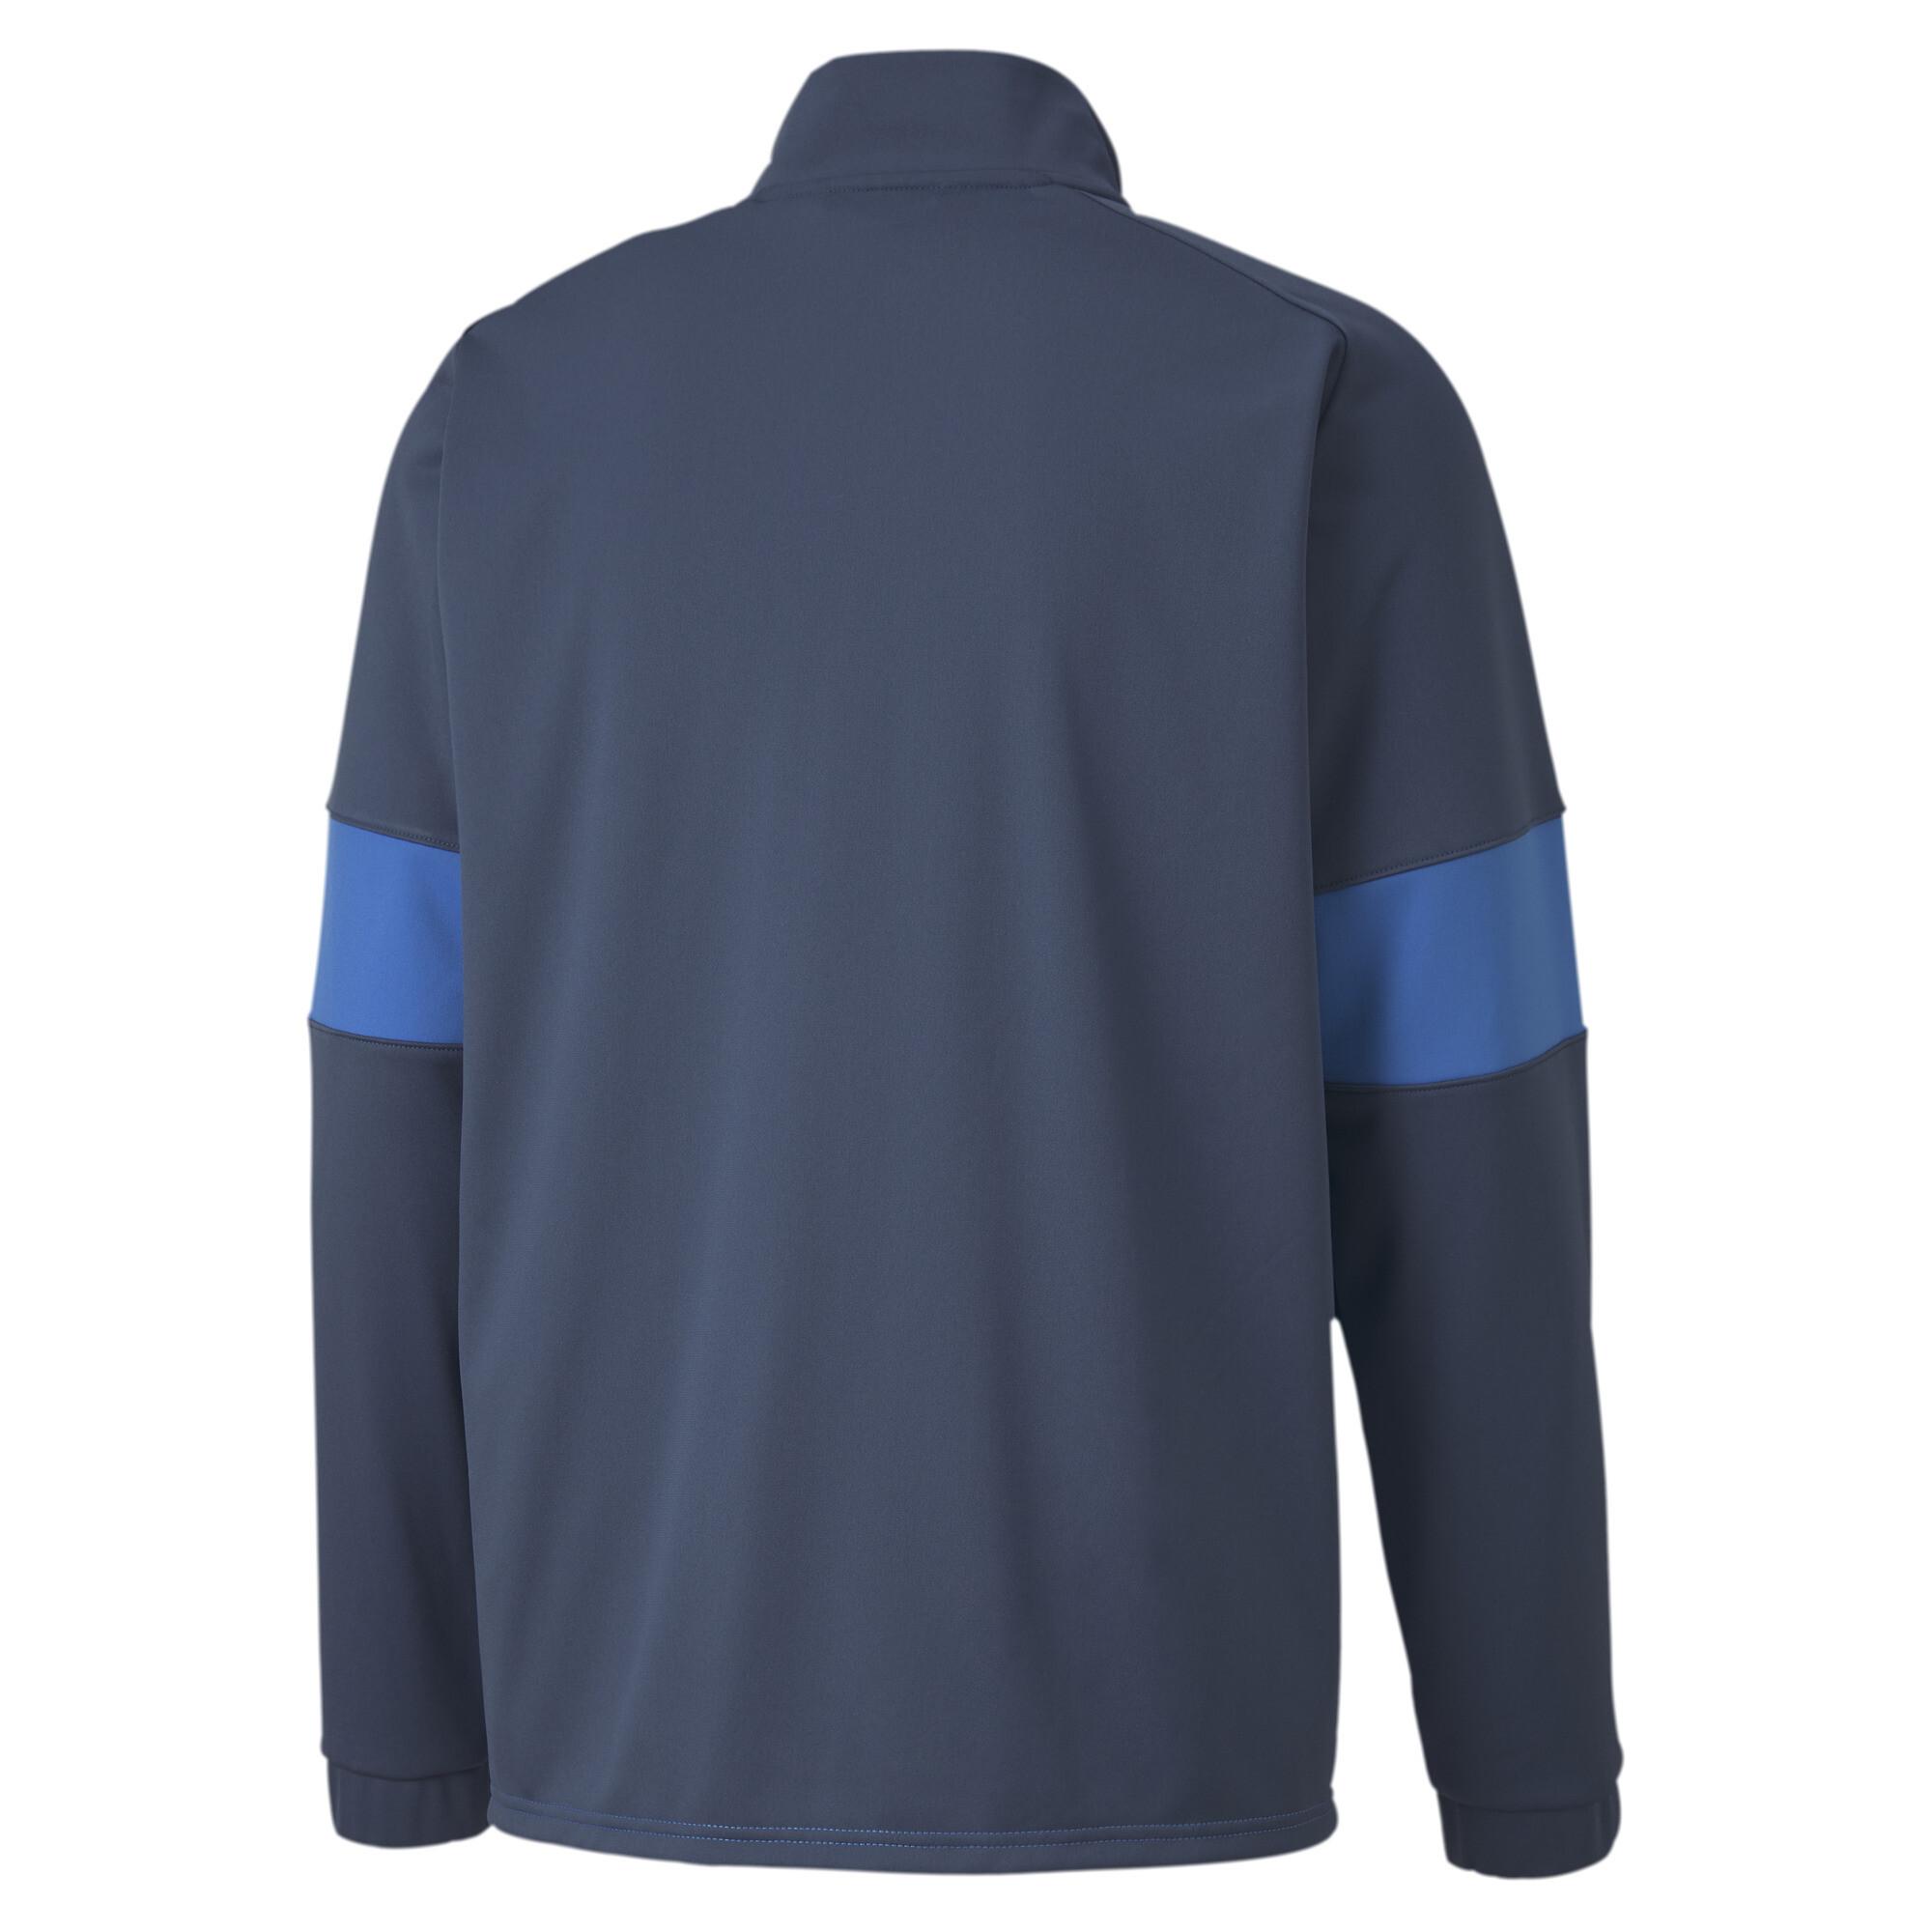 PUMA-PUMA-Blaster-Men-039-s-Jacket-Men-Knitted-Jacket-Training thumbnail 16